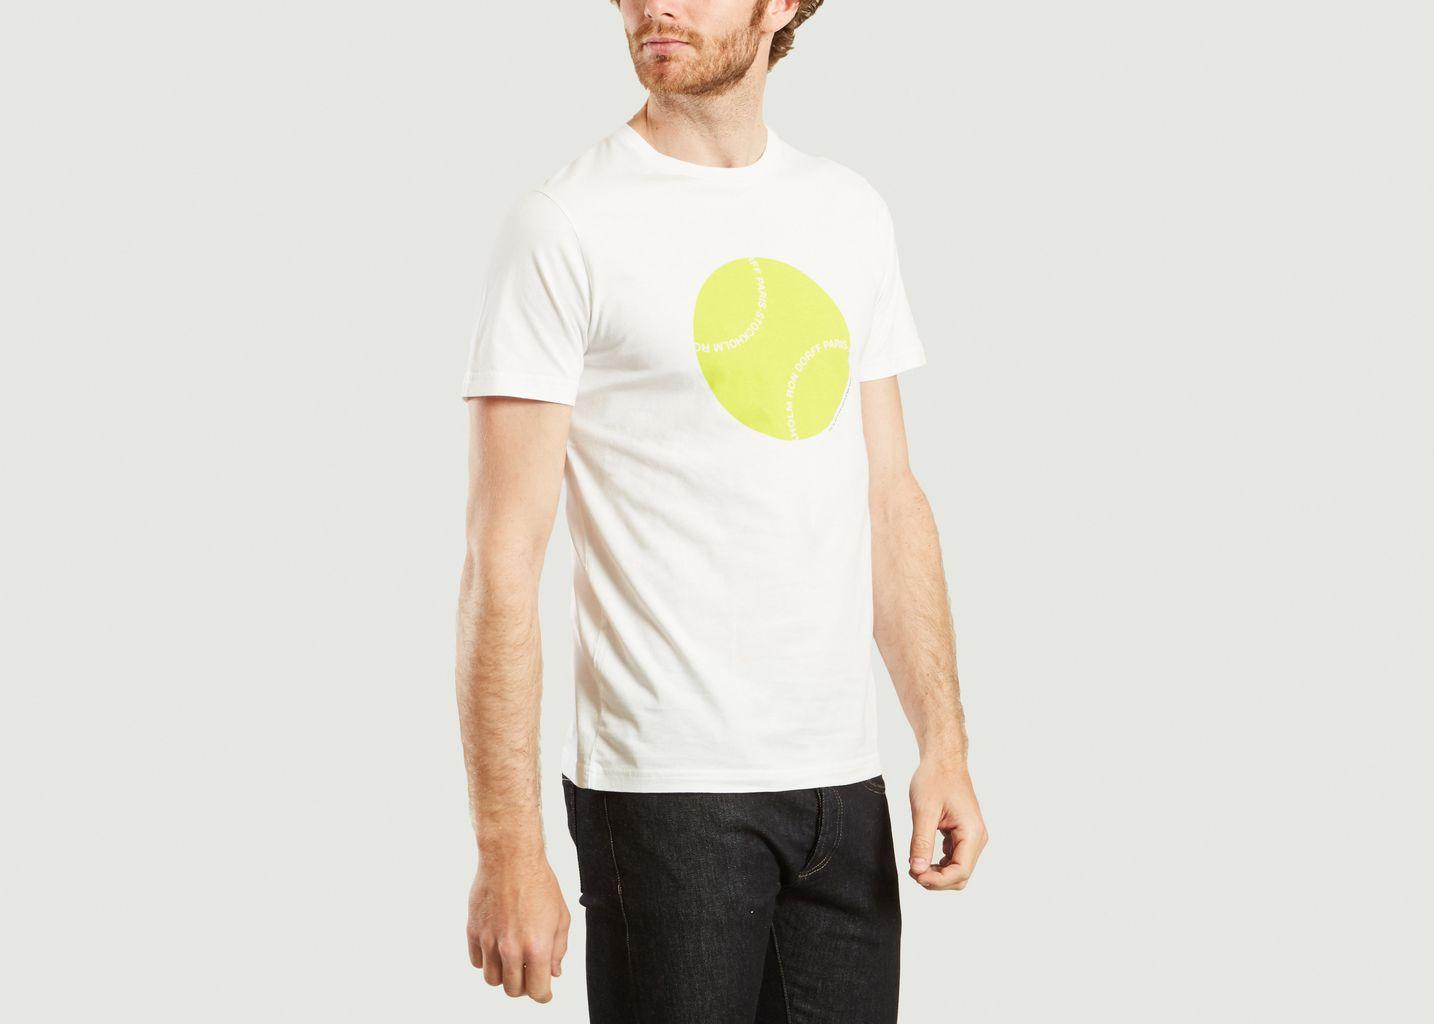 T-Shirt Yellow Ball  - Ron Dorff